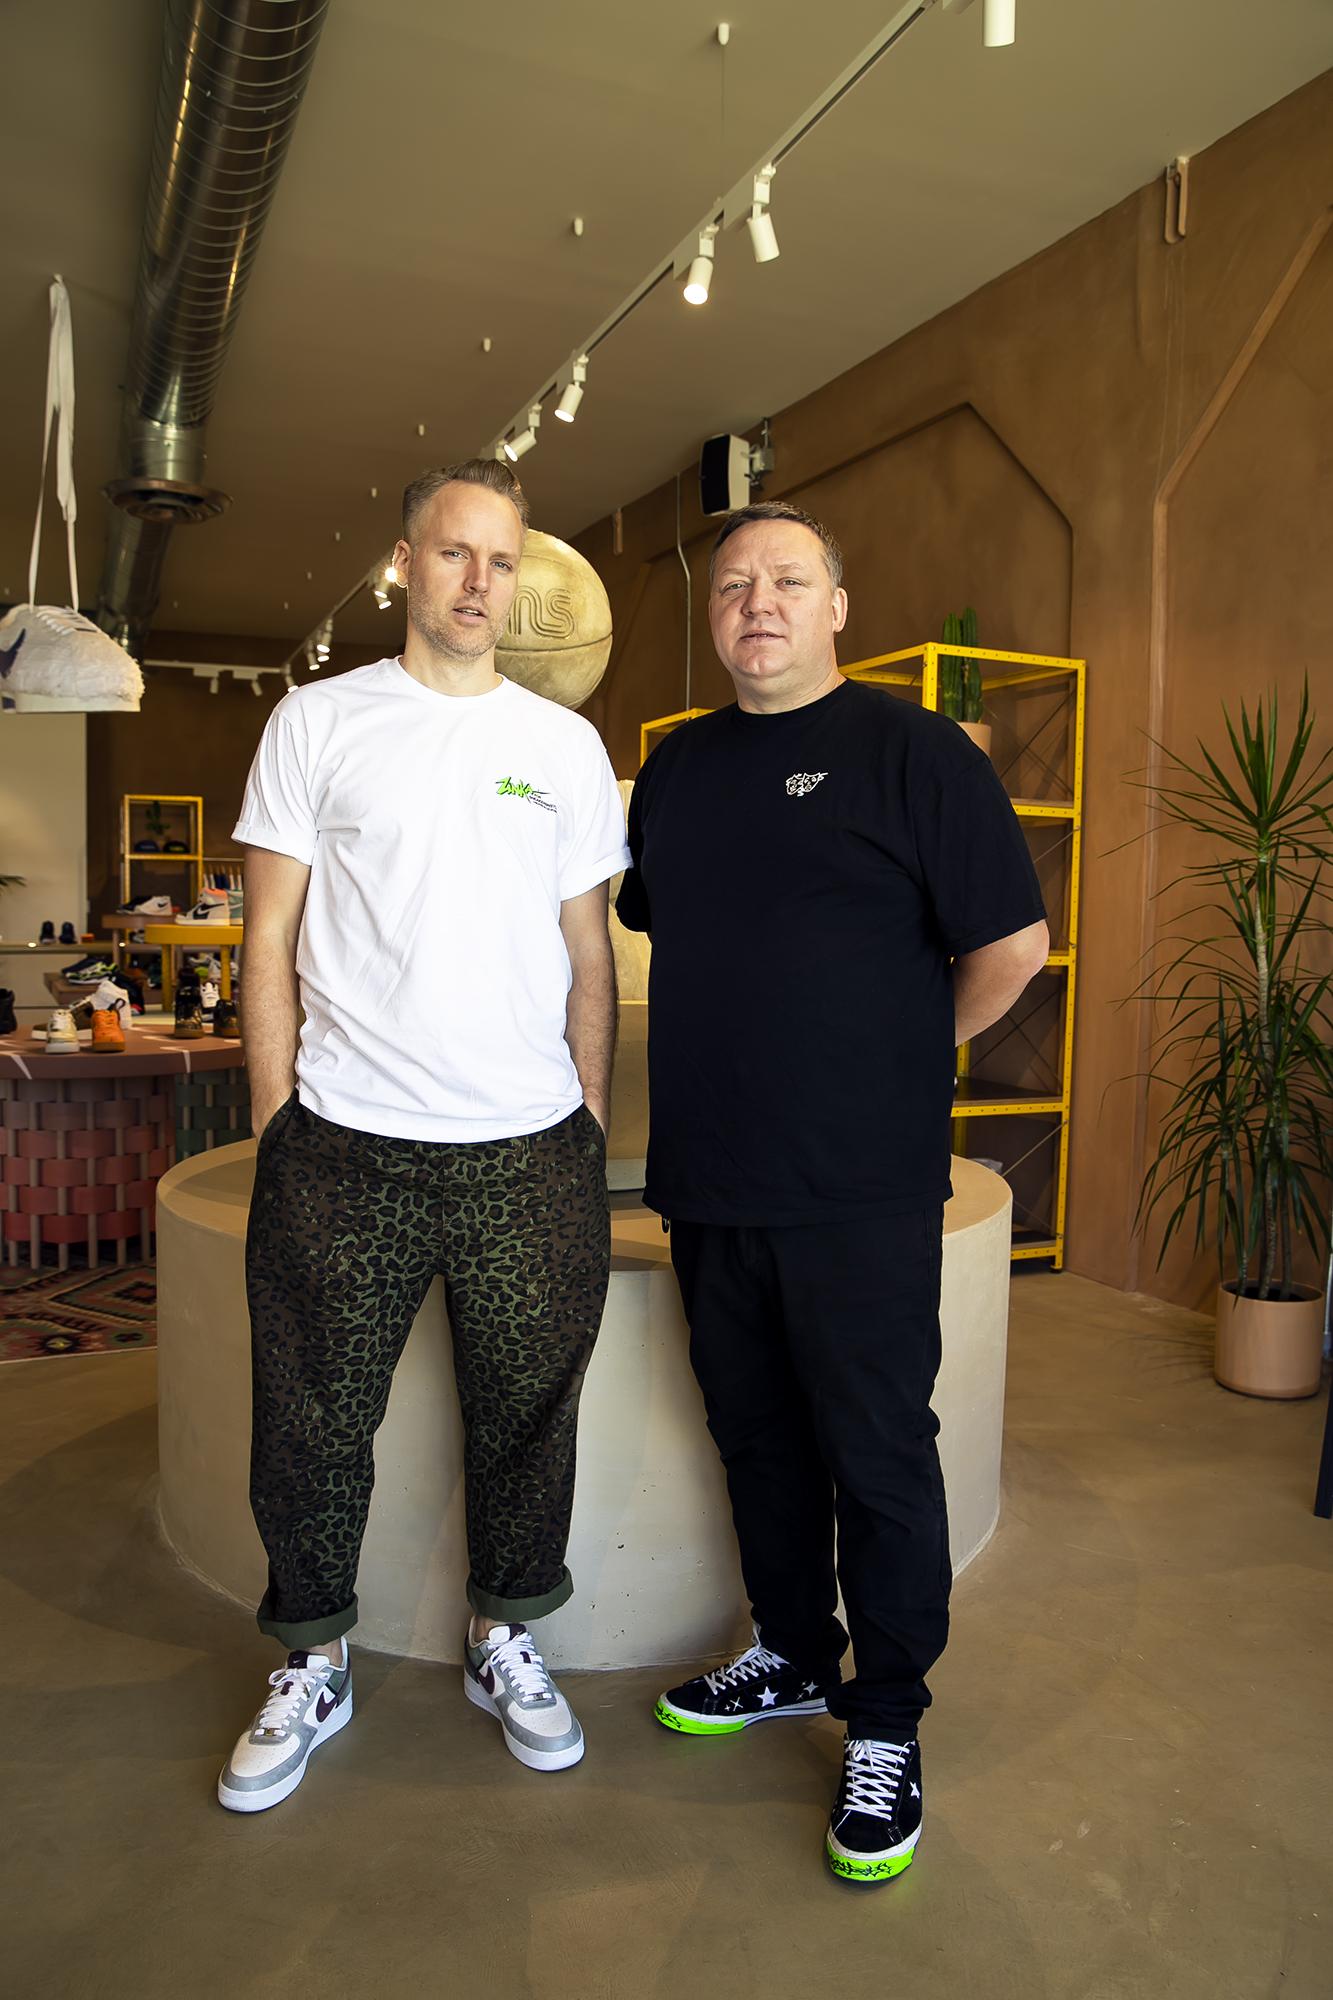 About us | sneakers \u0026 streetwear online